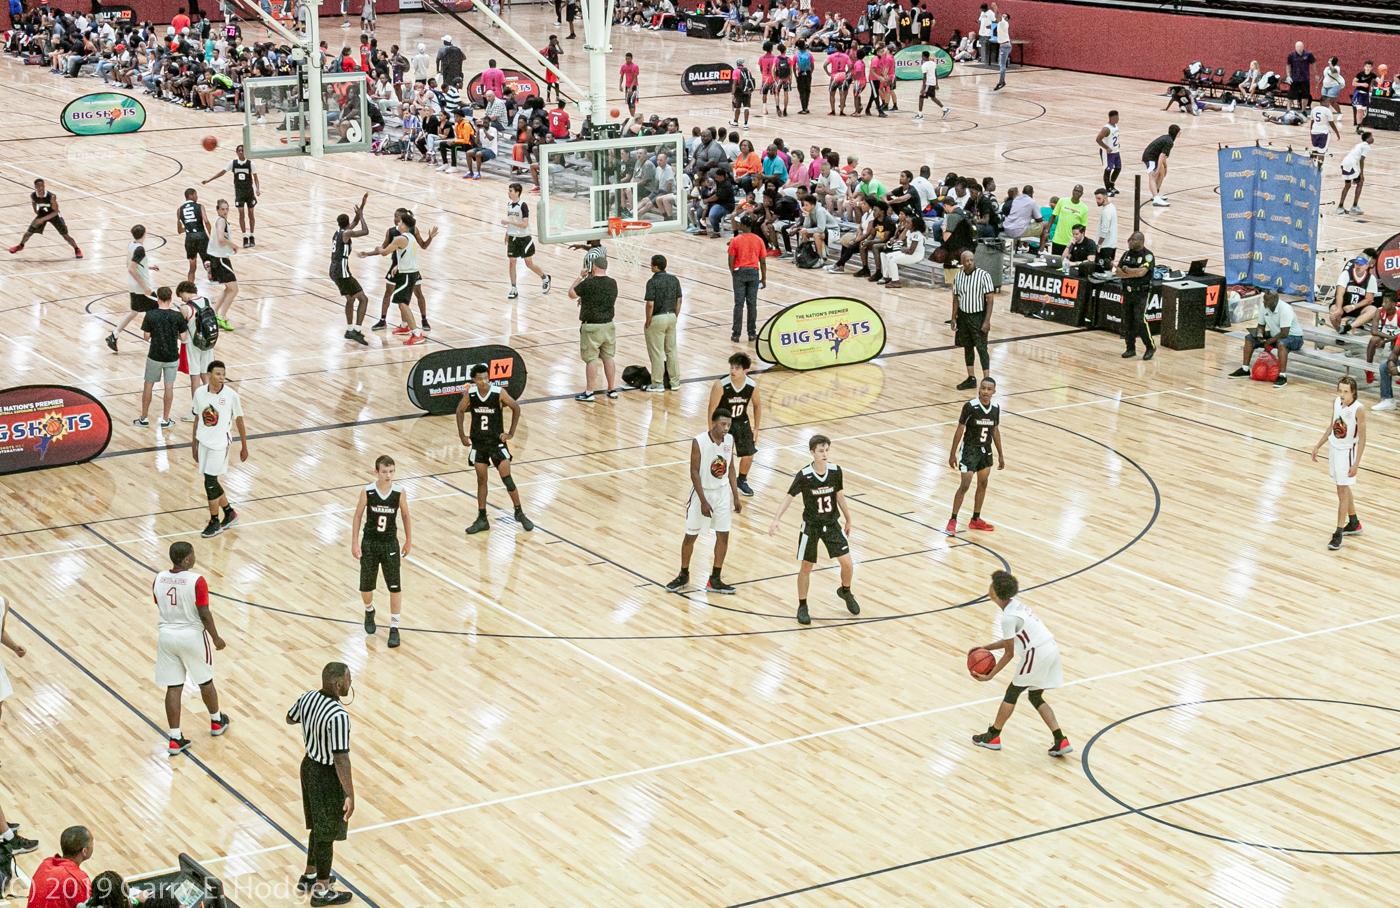 Travel basketball tournament at Rocky Mount Event Center